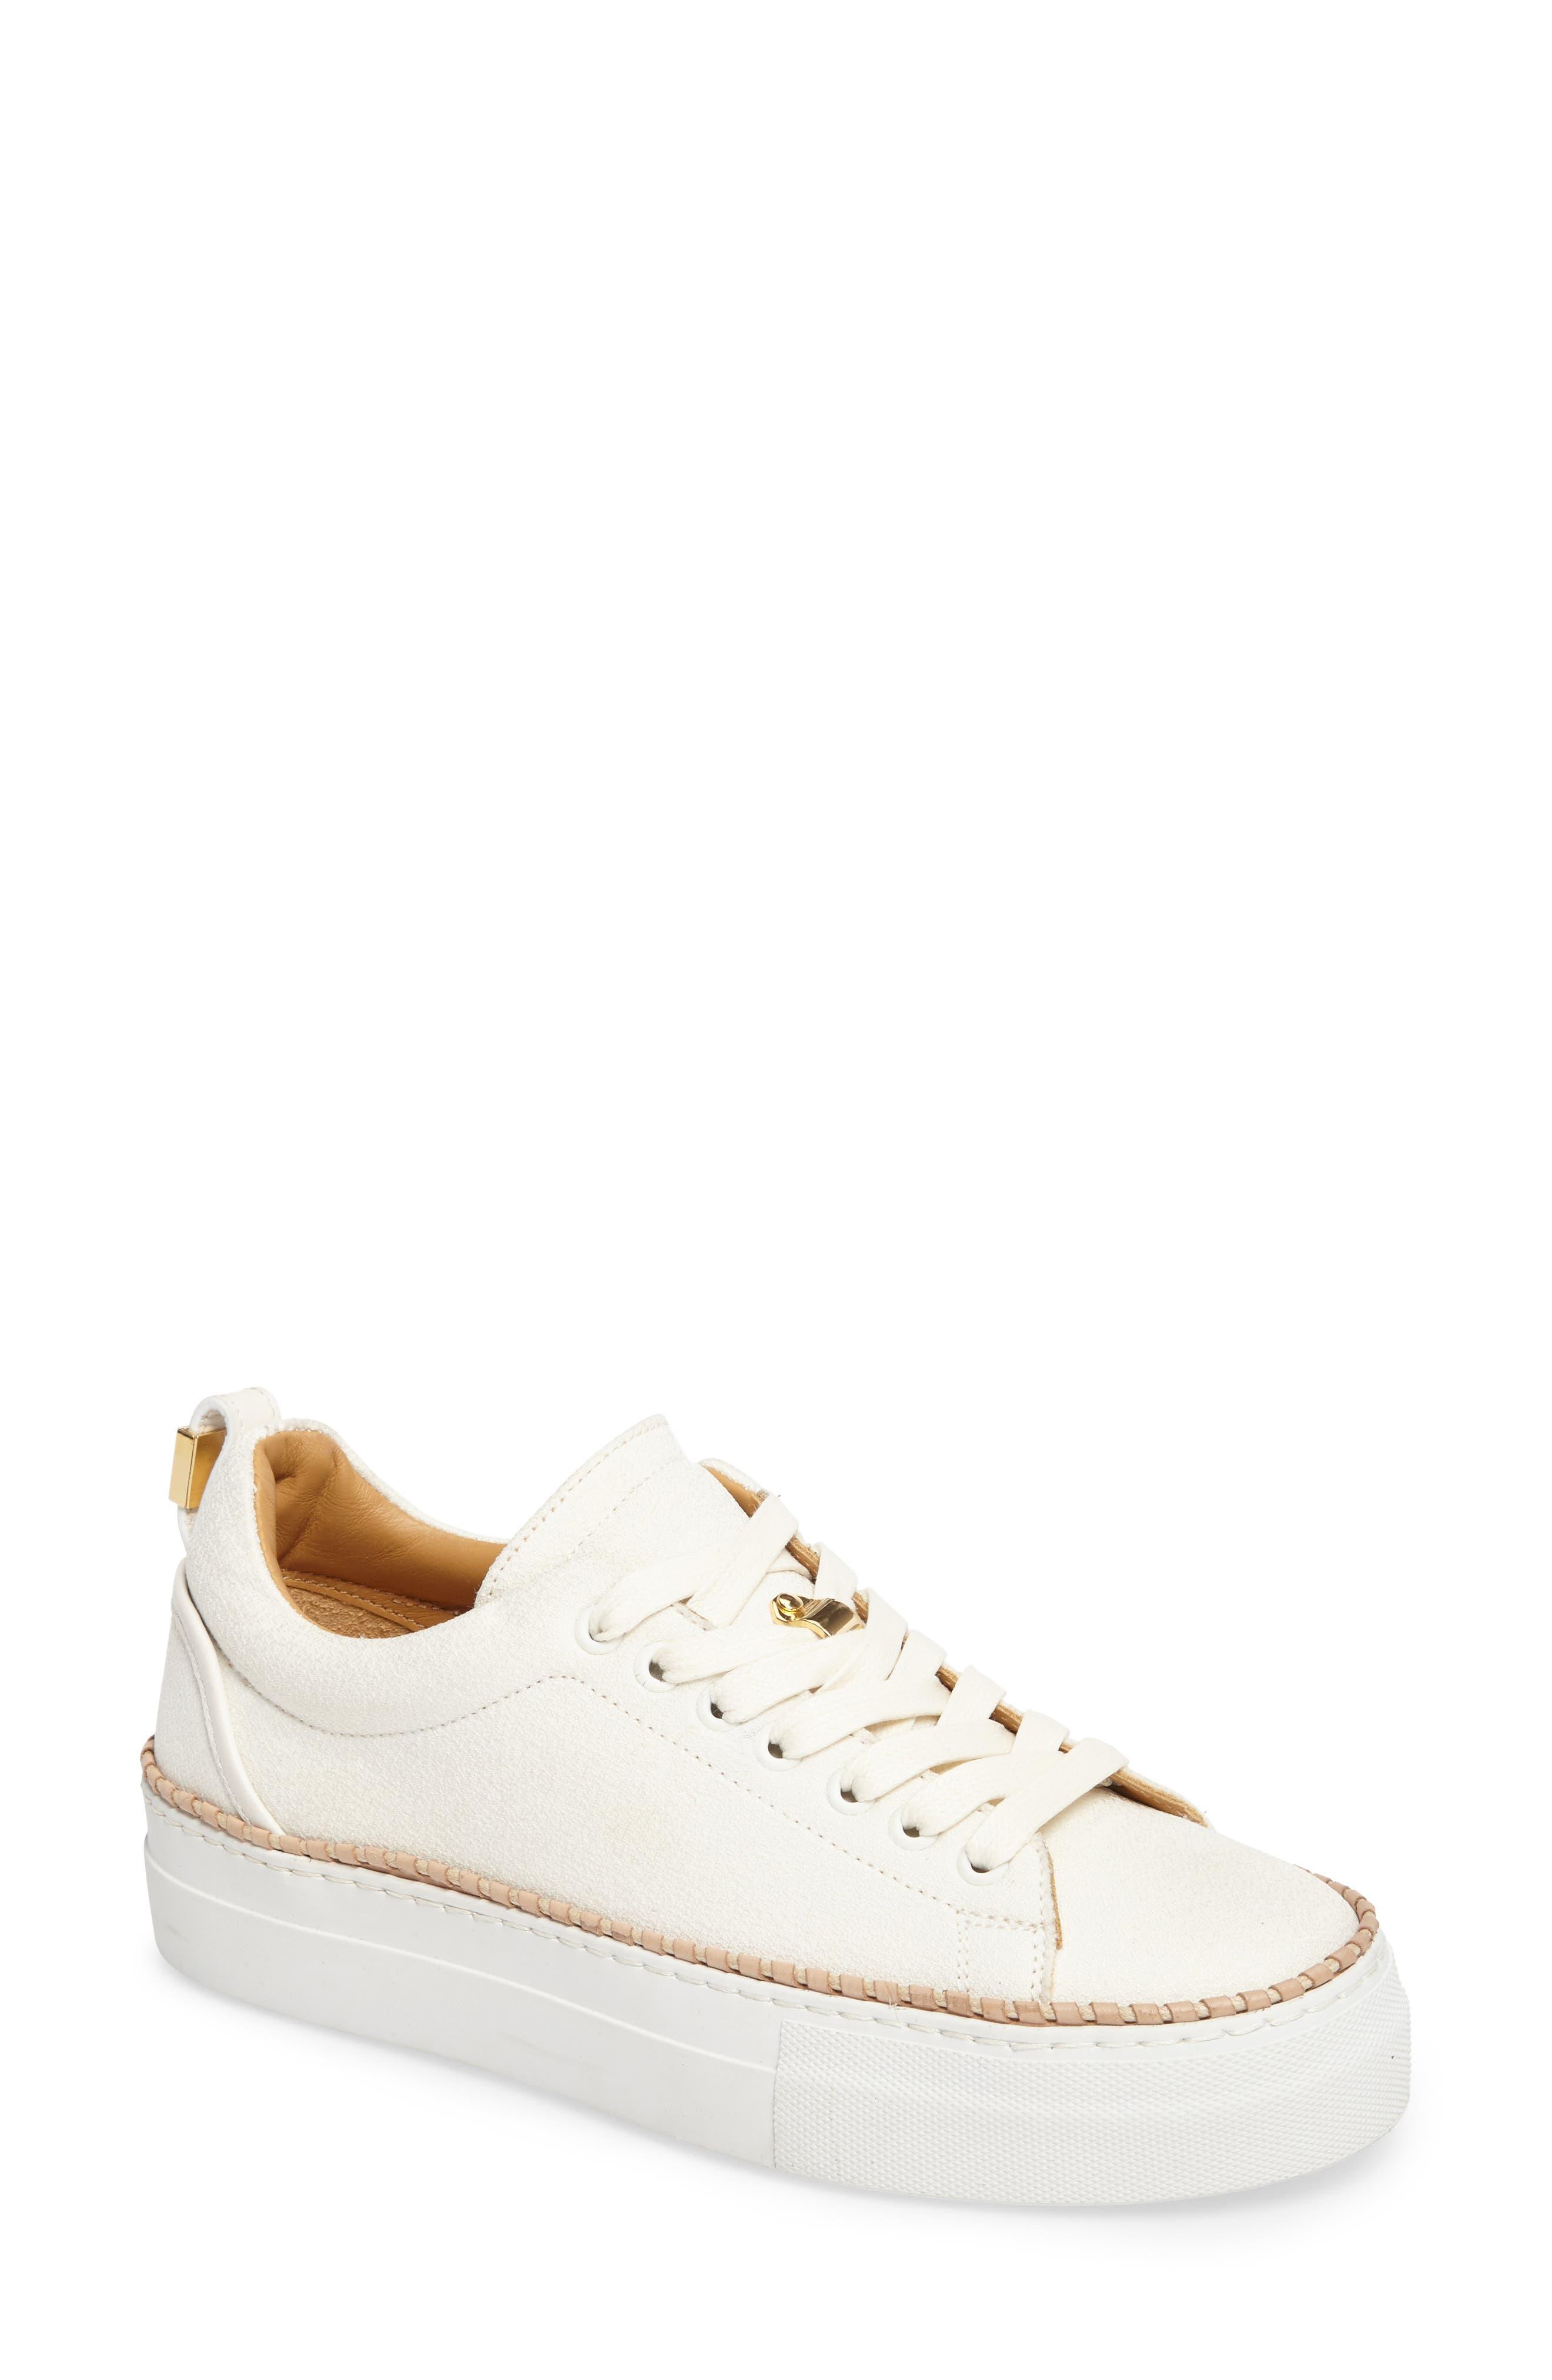 Alternate Image 1 Selected - Buscemi Tennis Crepone Sneaker (Women)